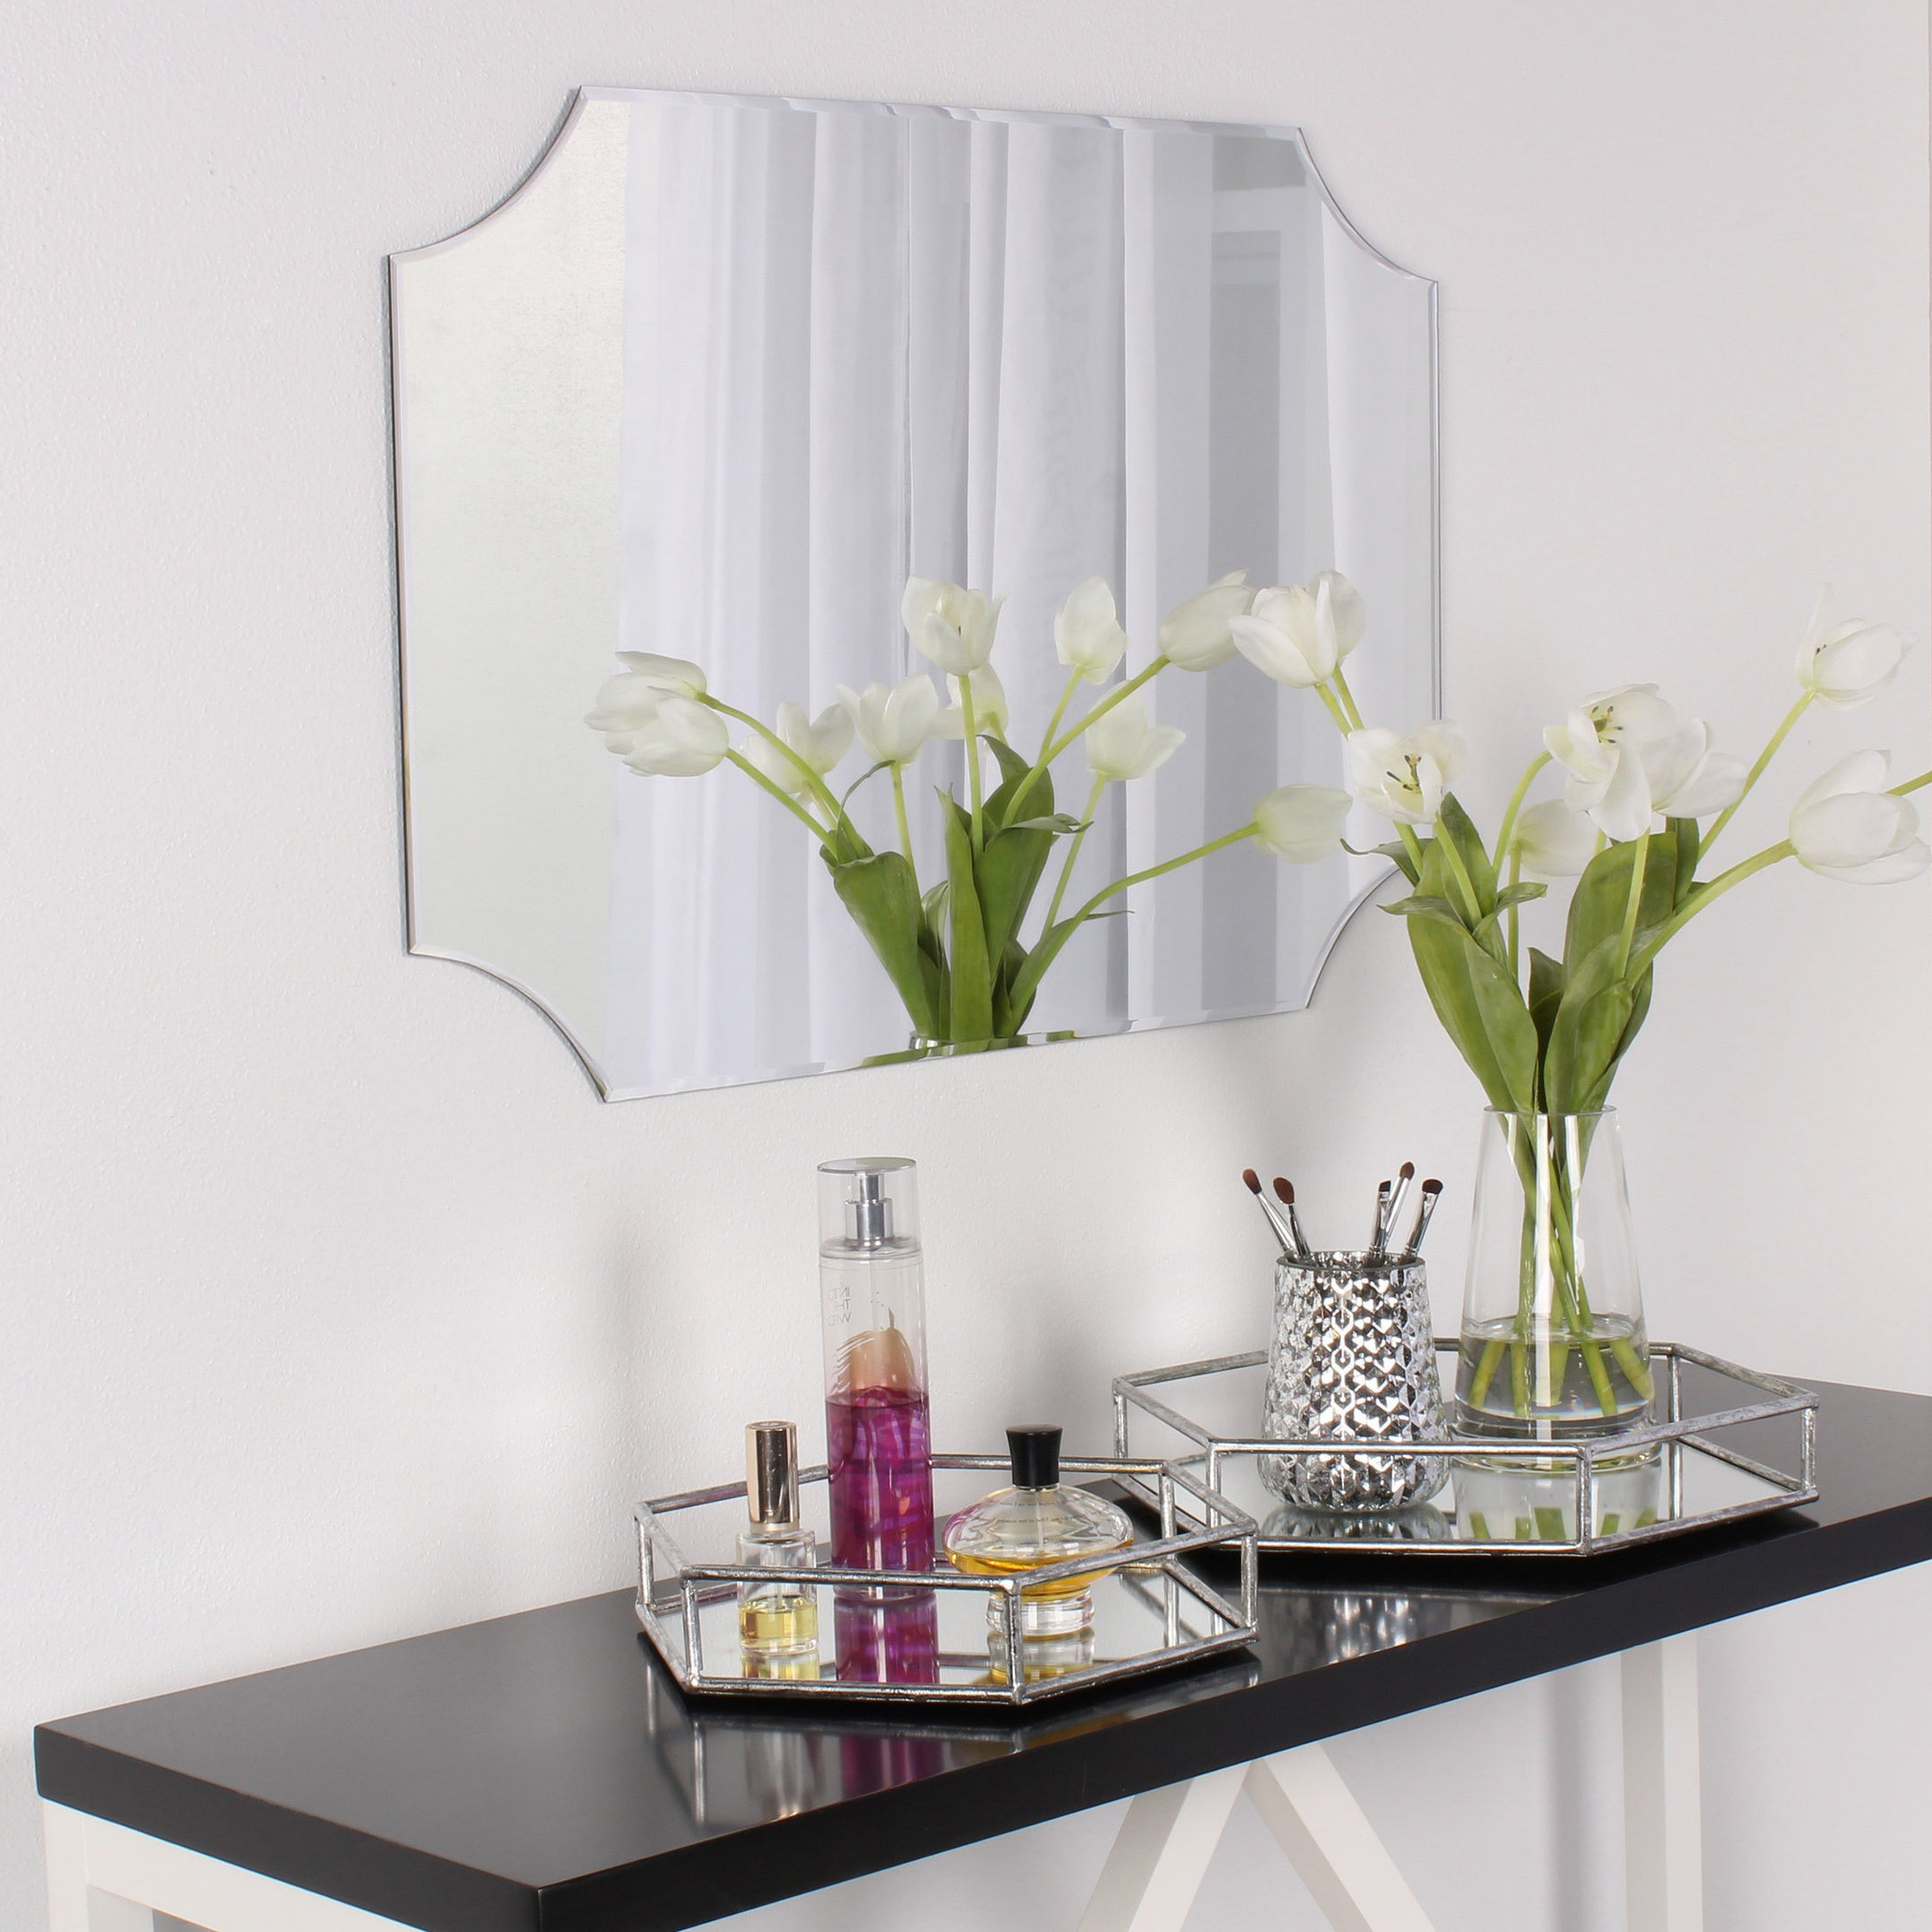 Designovation Reign Frameless Rectangle Scalloped Beveled Mirror – Silver – 19X28 Intended For Reign Frameless Oval Scalloped Beveled Wall Mirrors (View 5 of 20)